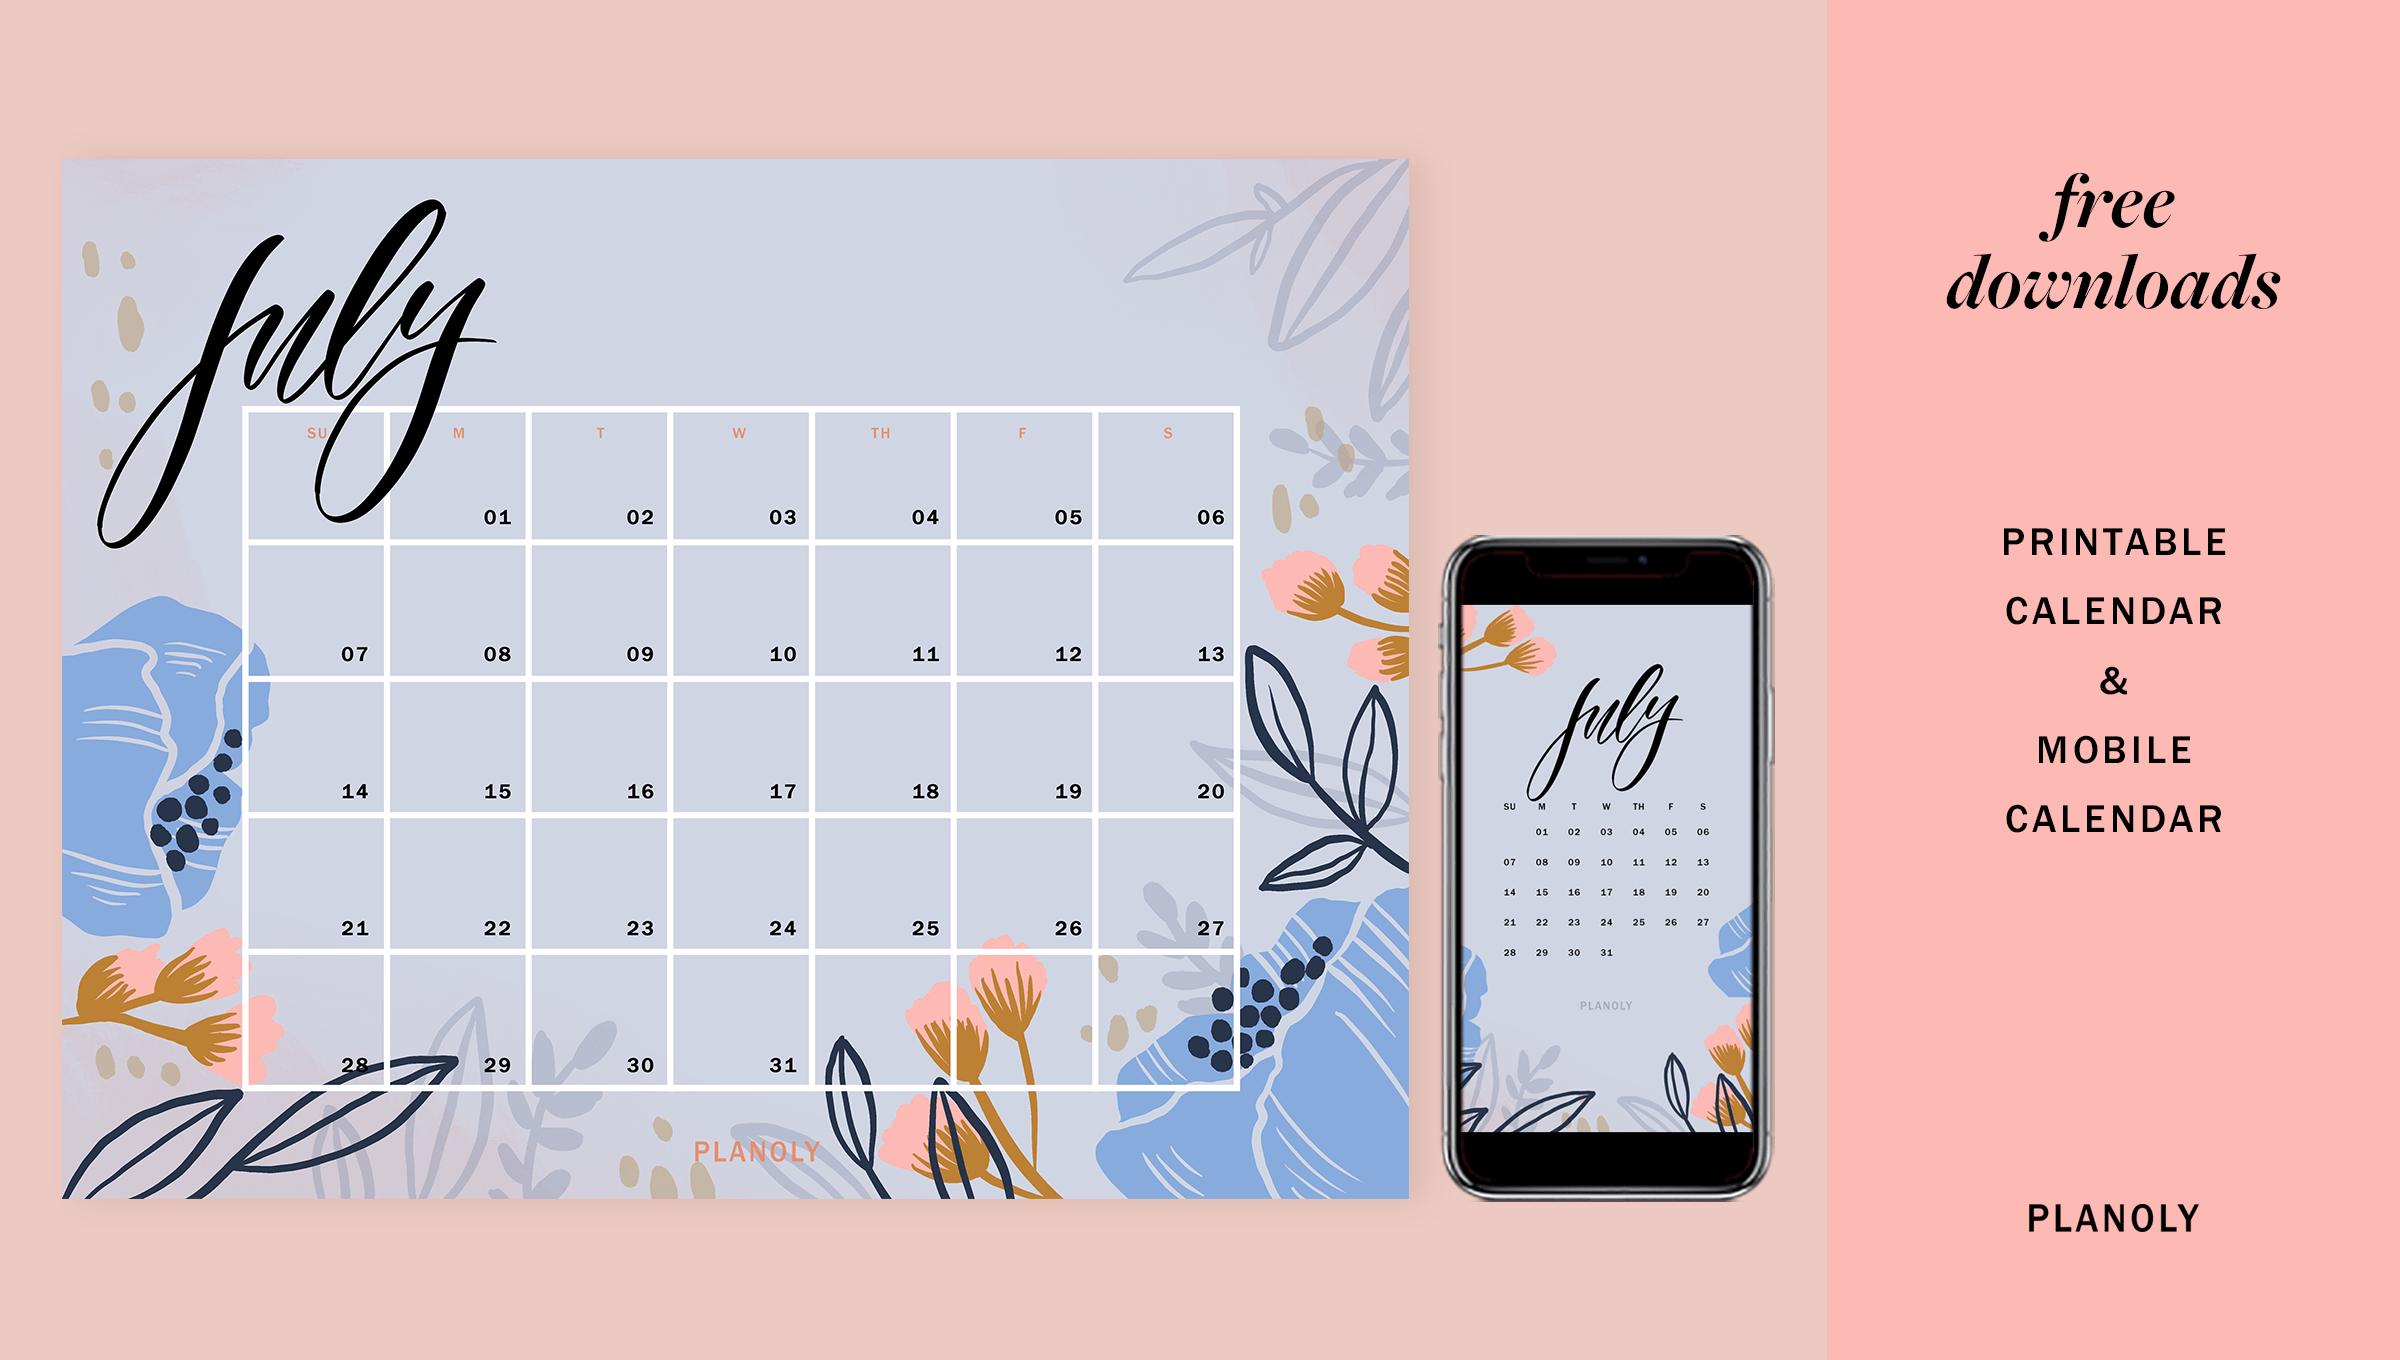 Q3 2019 Content Calendars